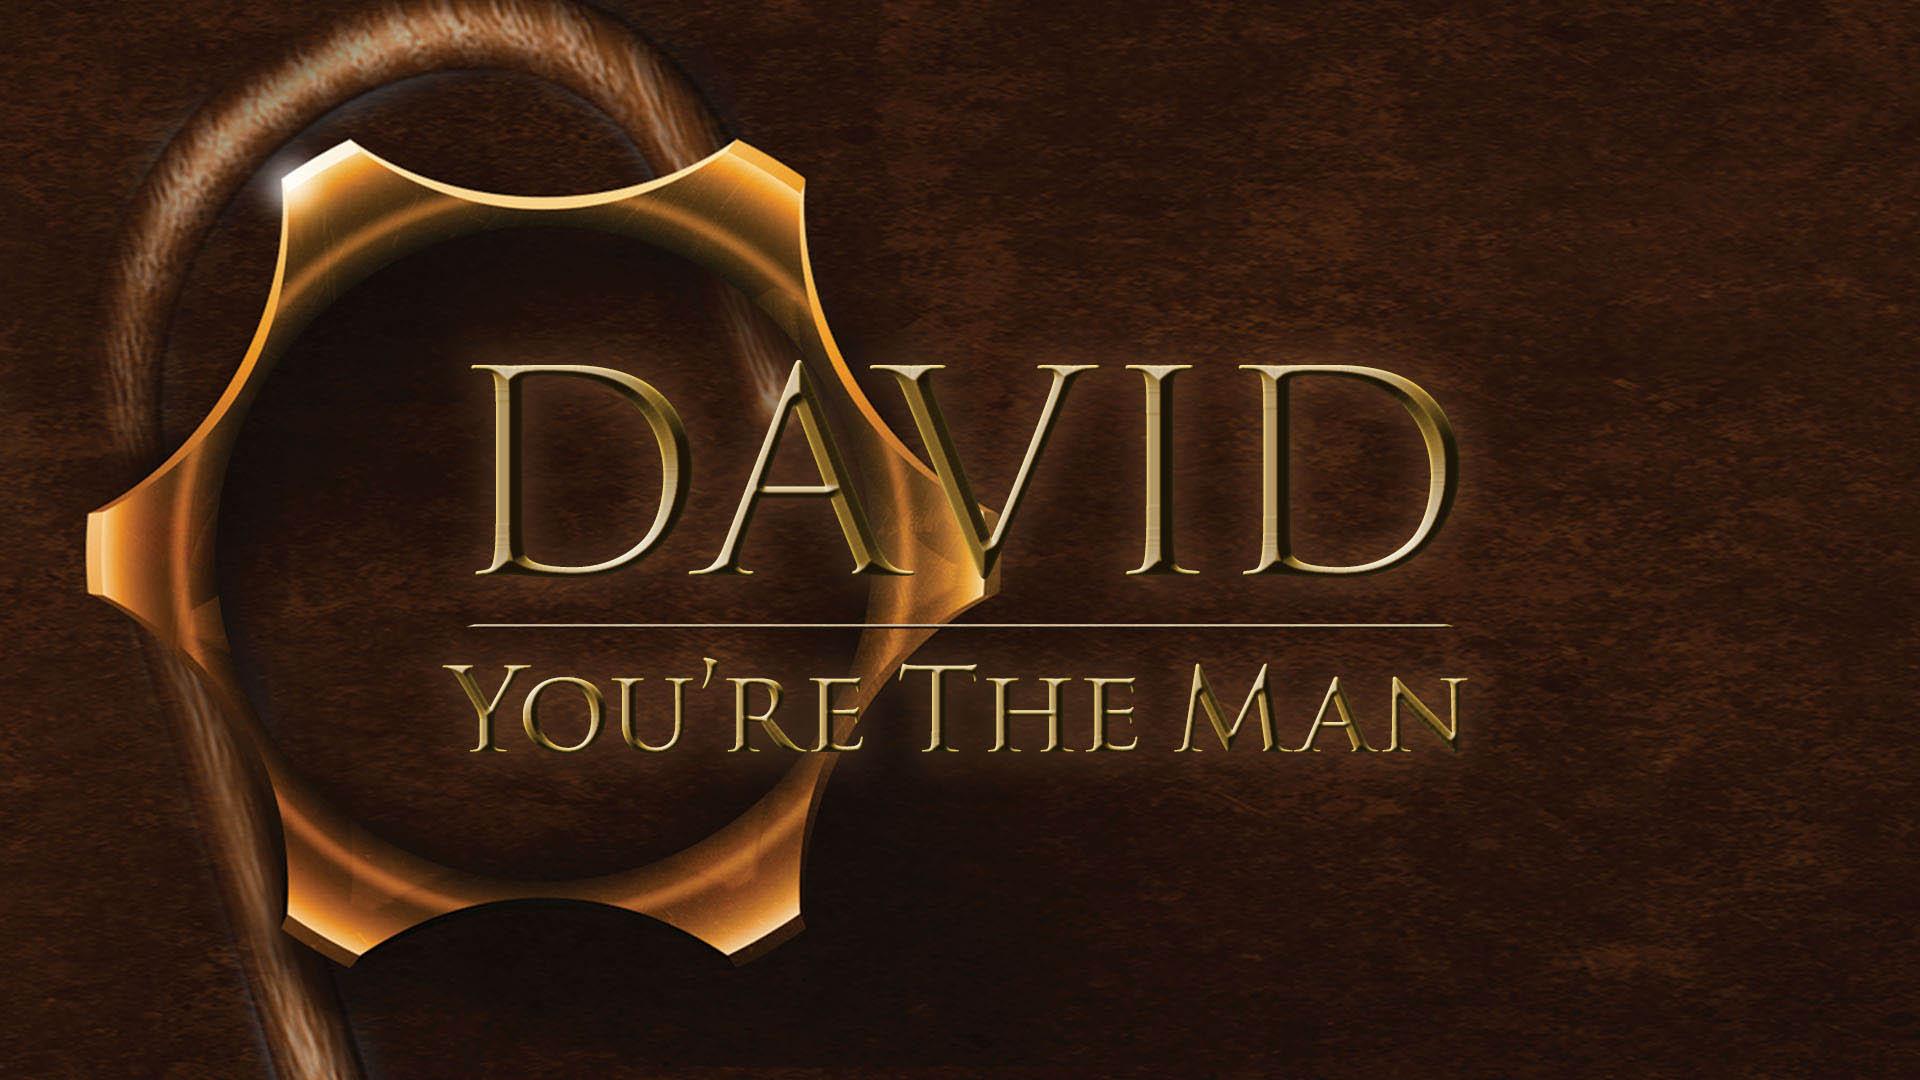 David - You're The Man